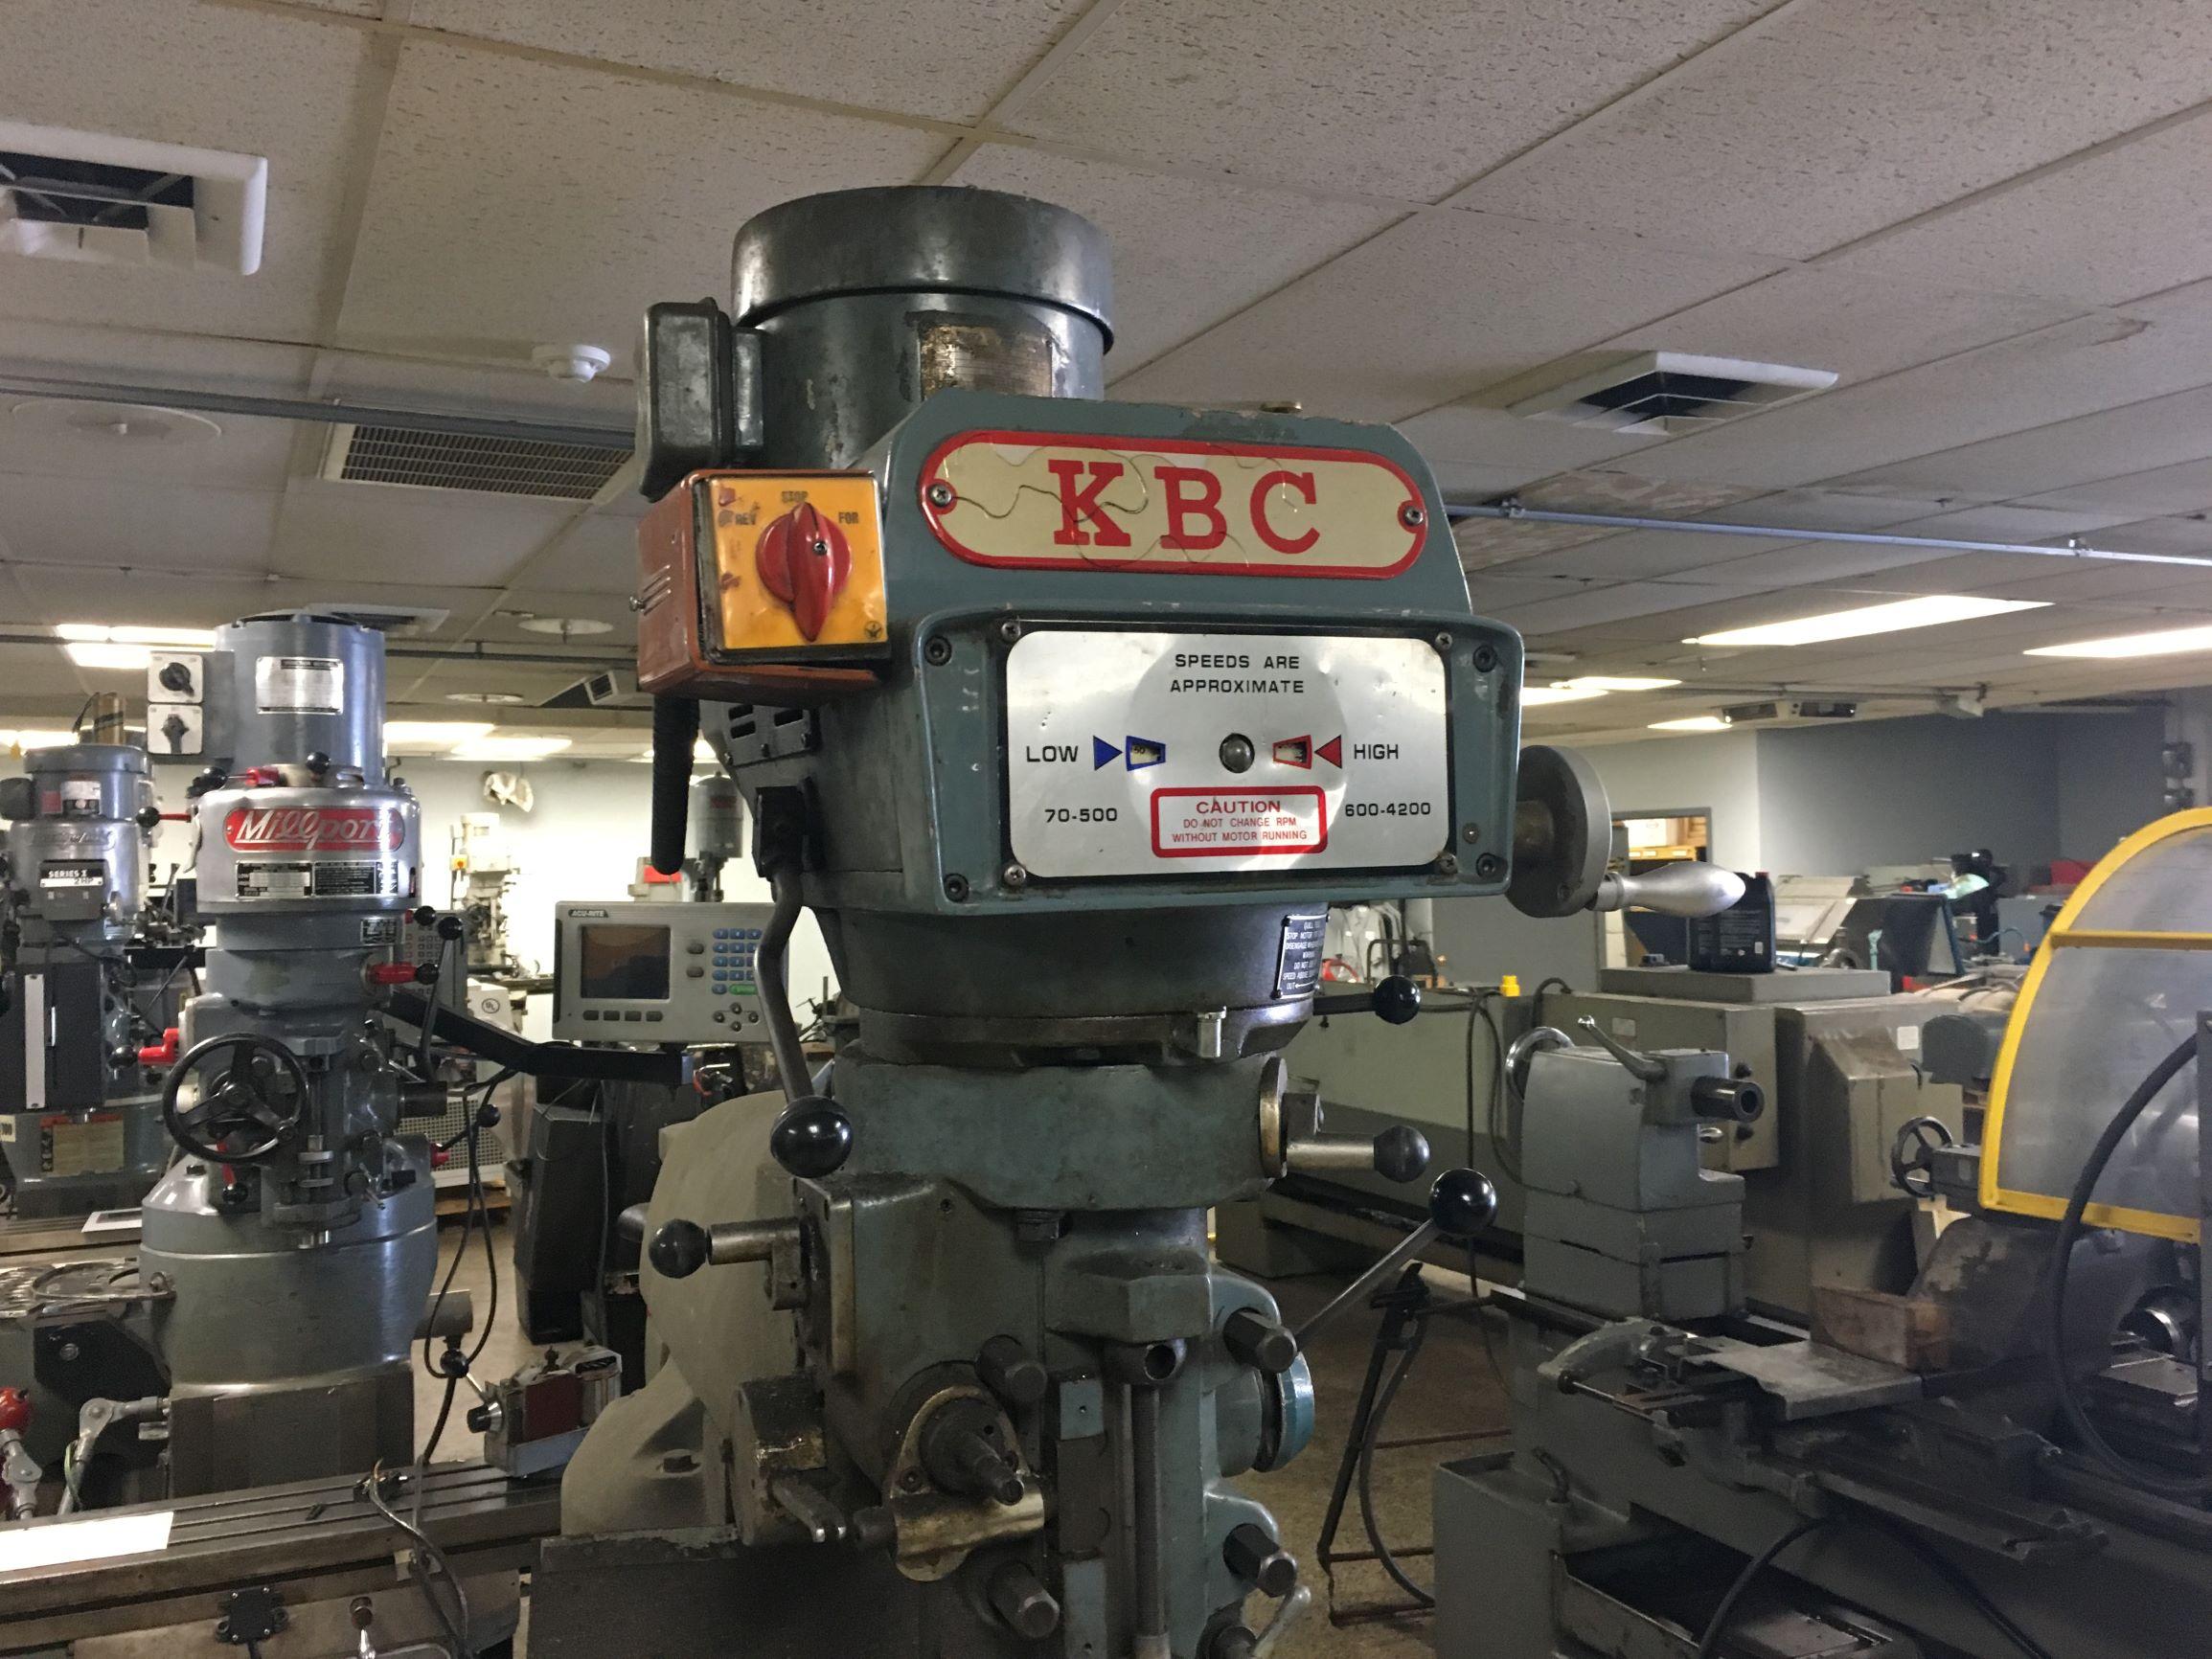 KBC Model TUM-1VS Vertical Milling Machine, S/N 0977 - for parts